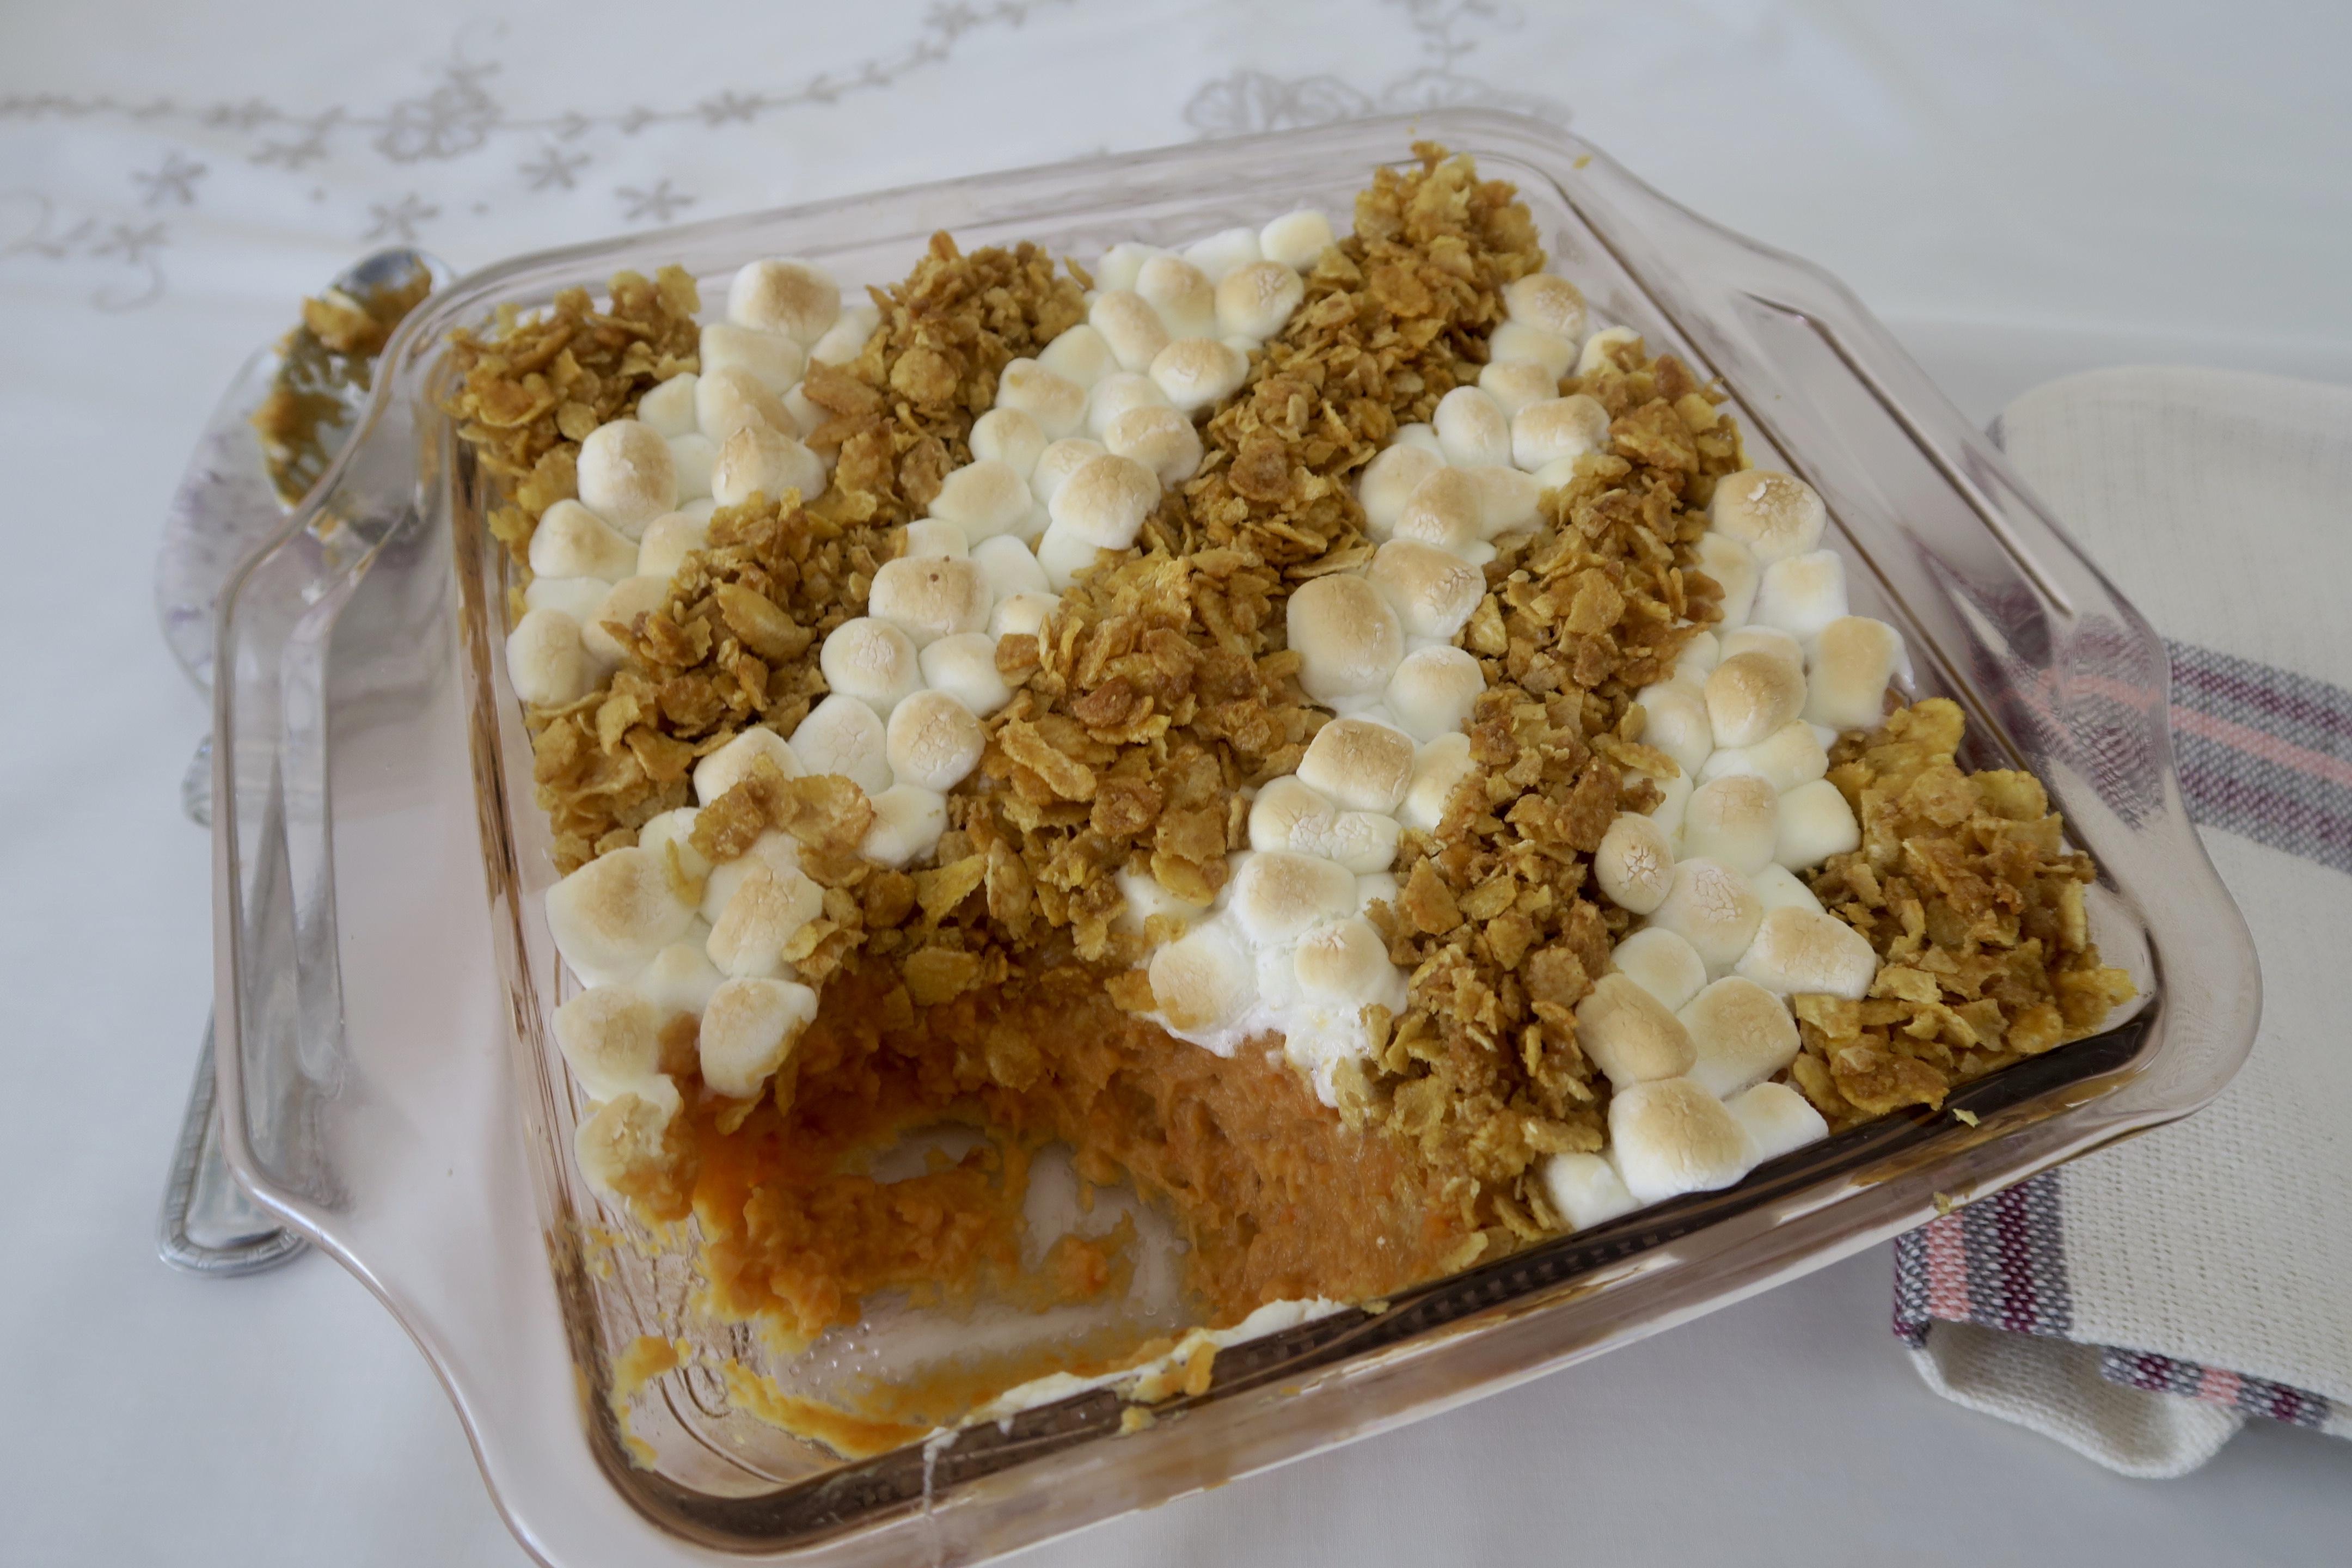 Marshmallow & Cornflake Sweet Potato Casserole Michaela Mercer Rosenthal